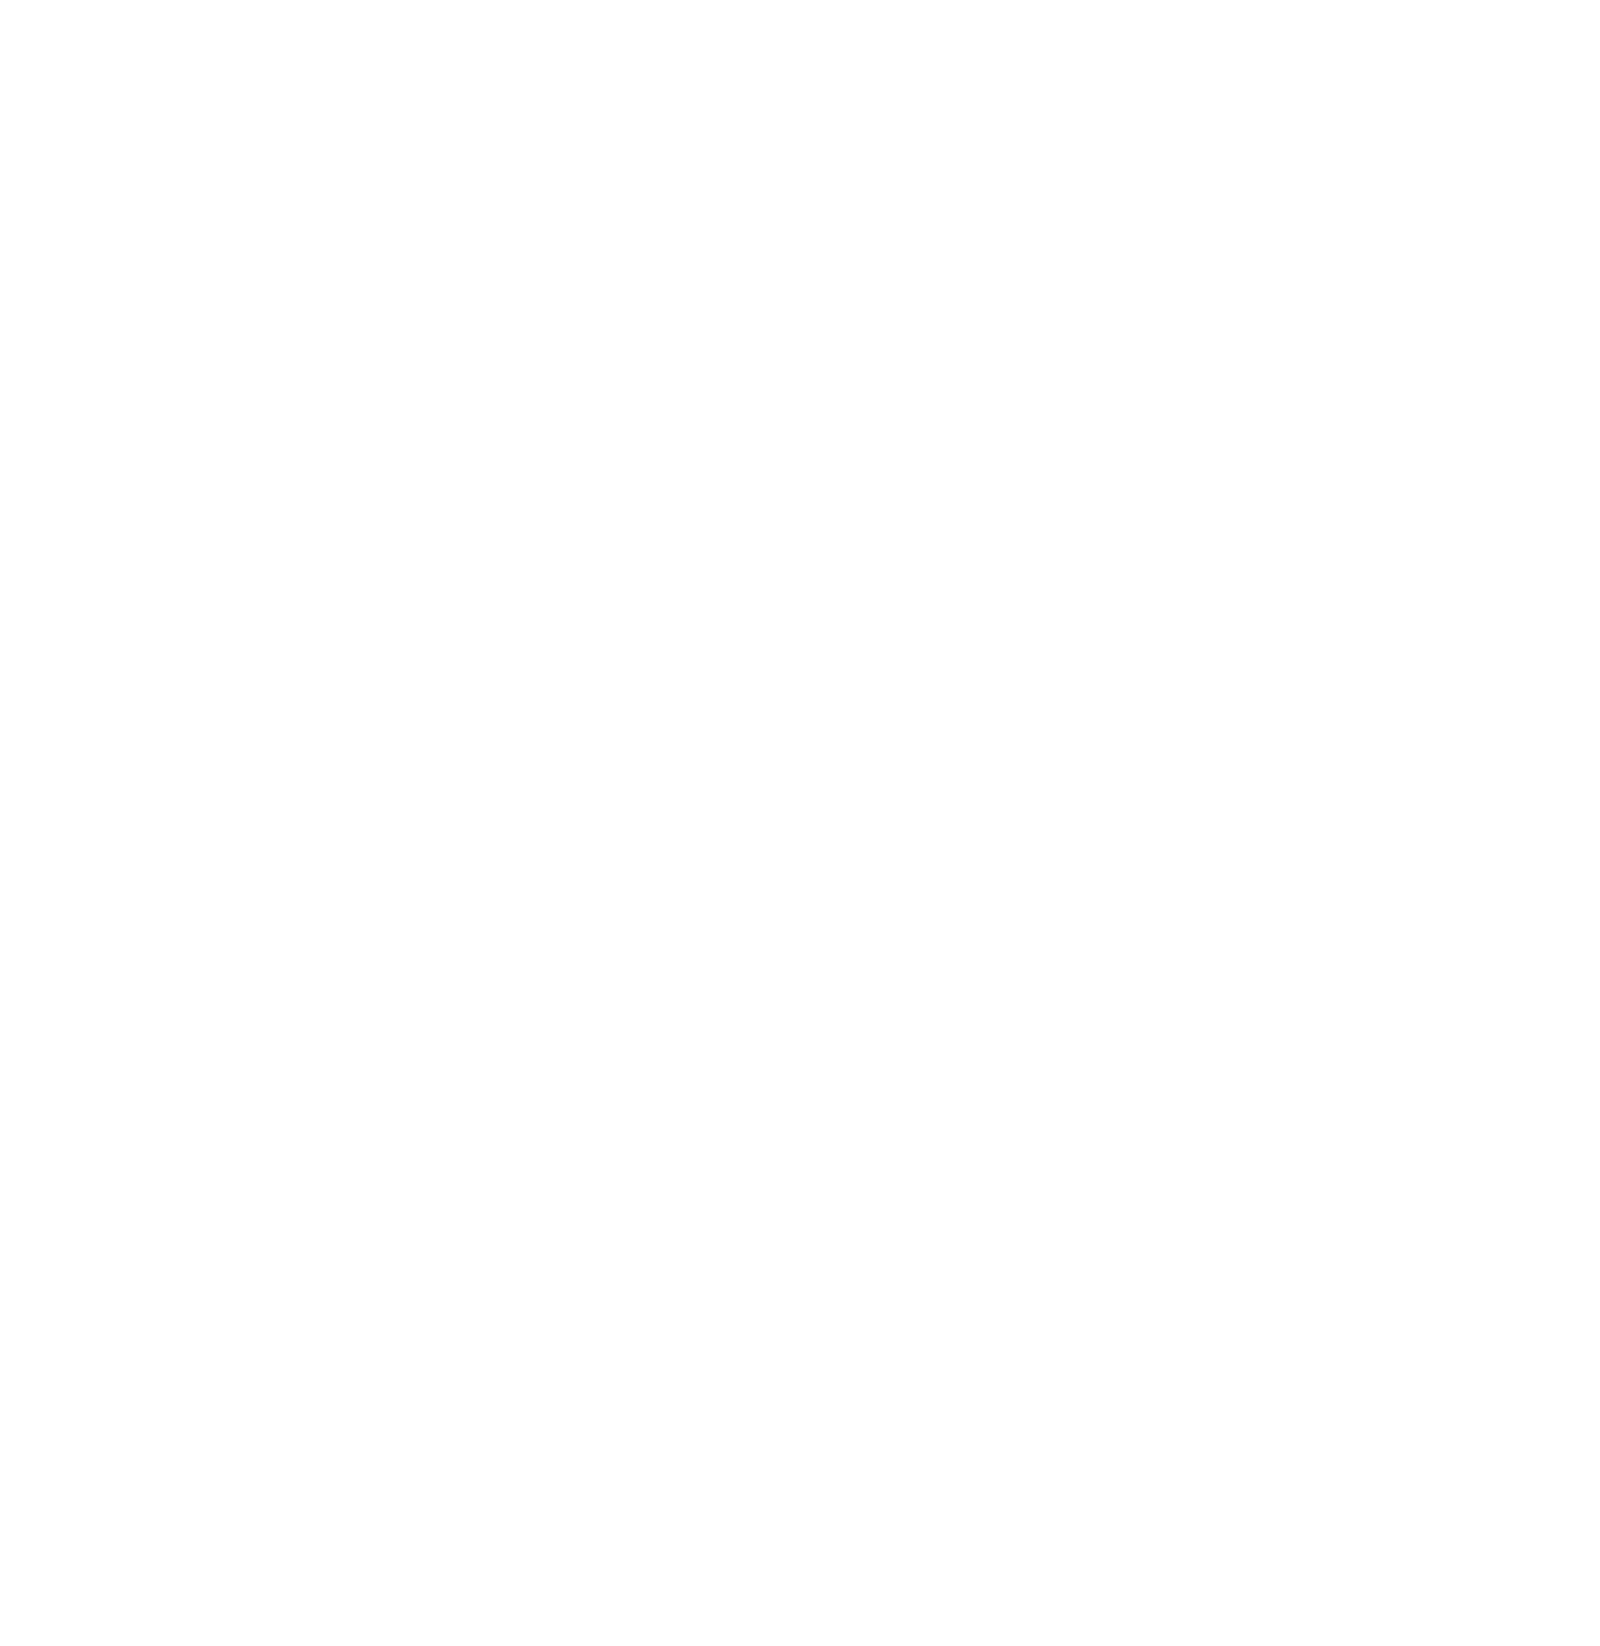 https://myfasciatraining.com/content/uploads/2020/08/newsletter.png